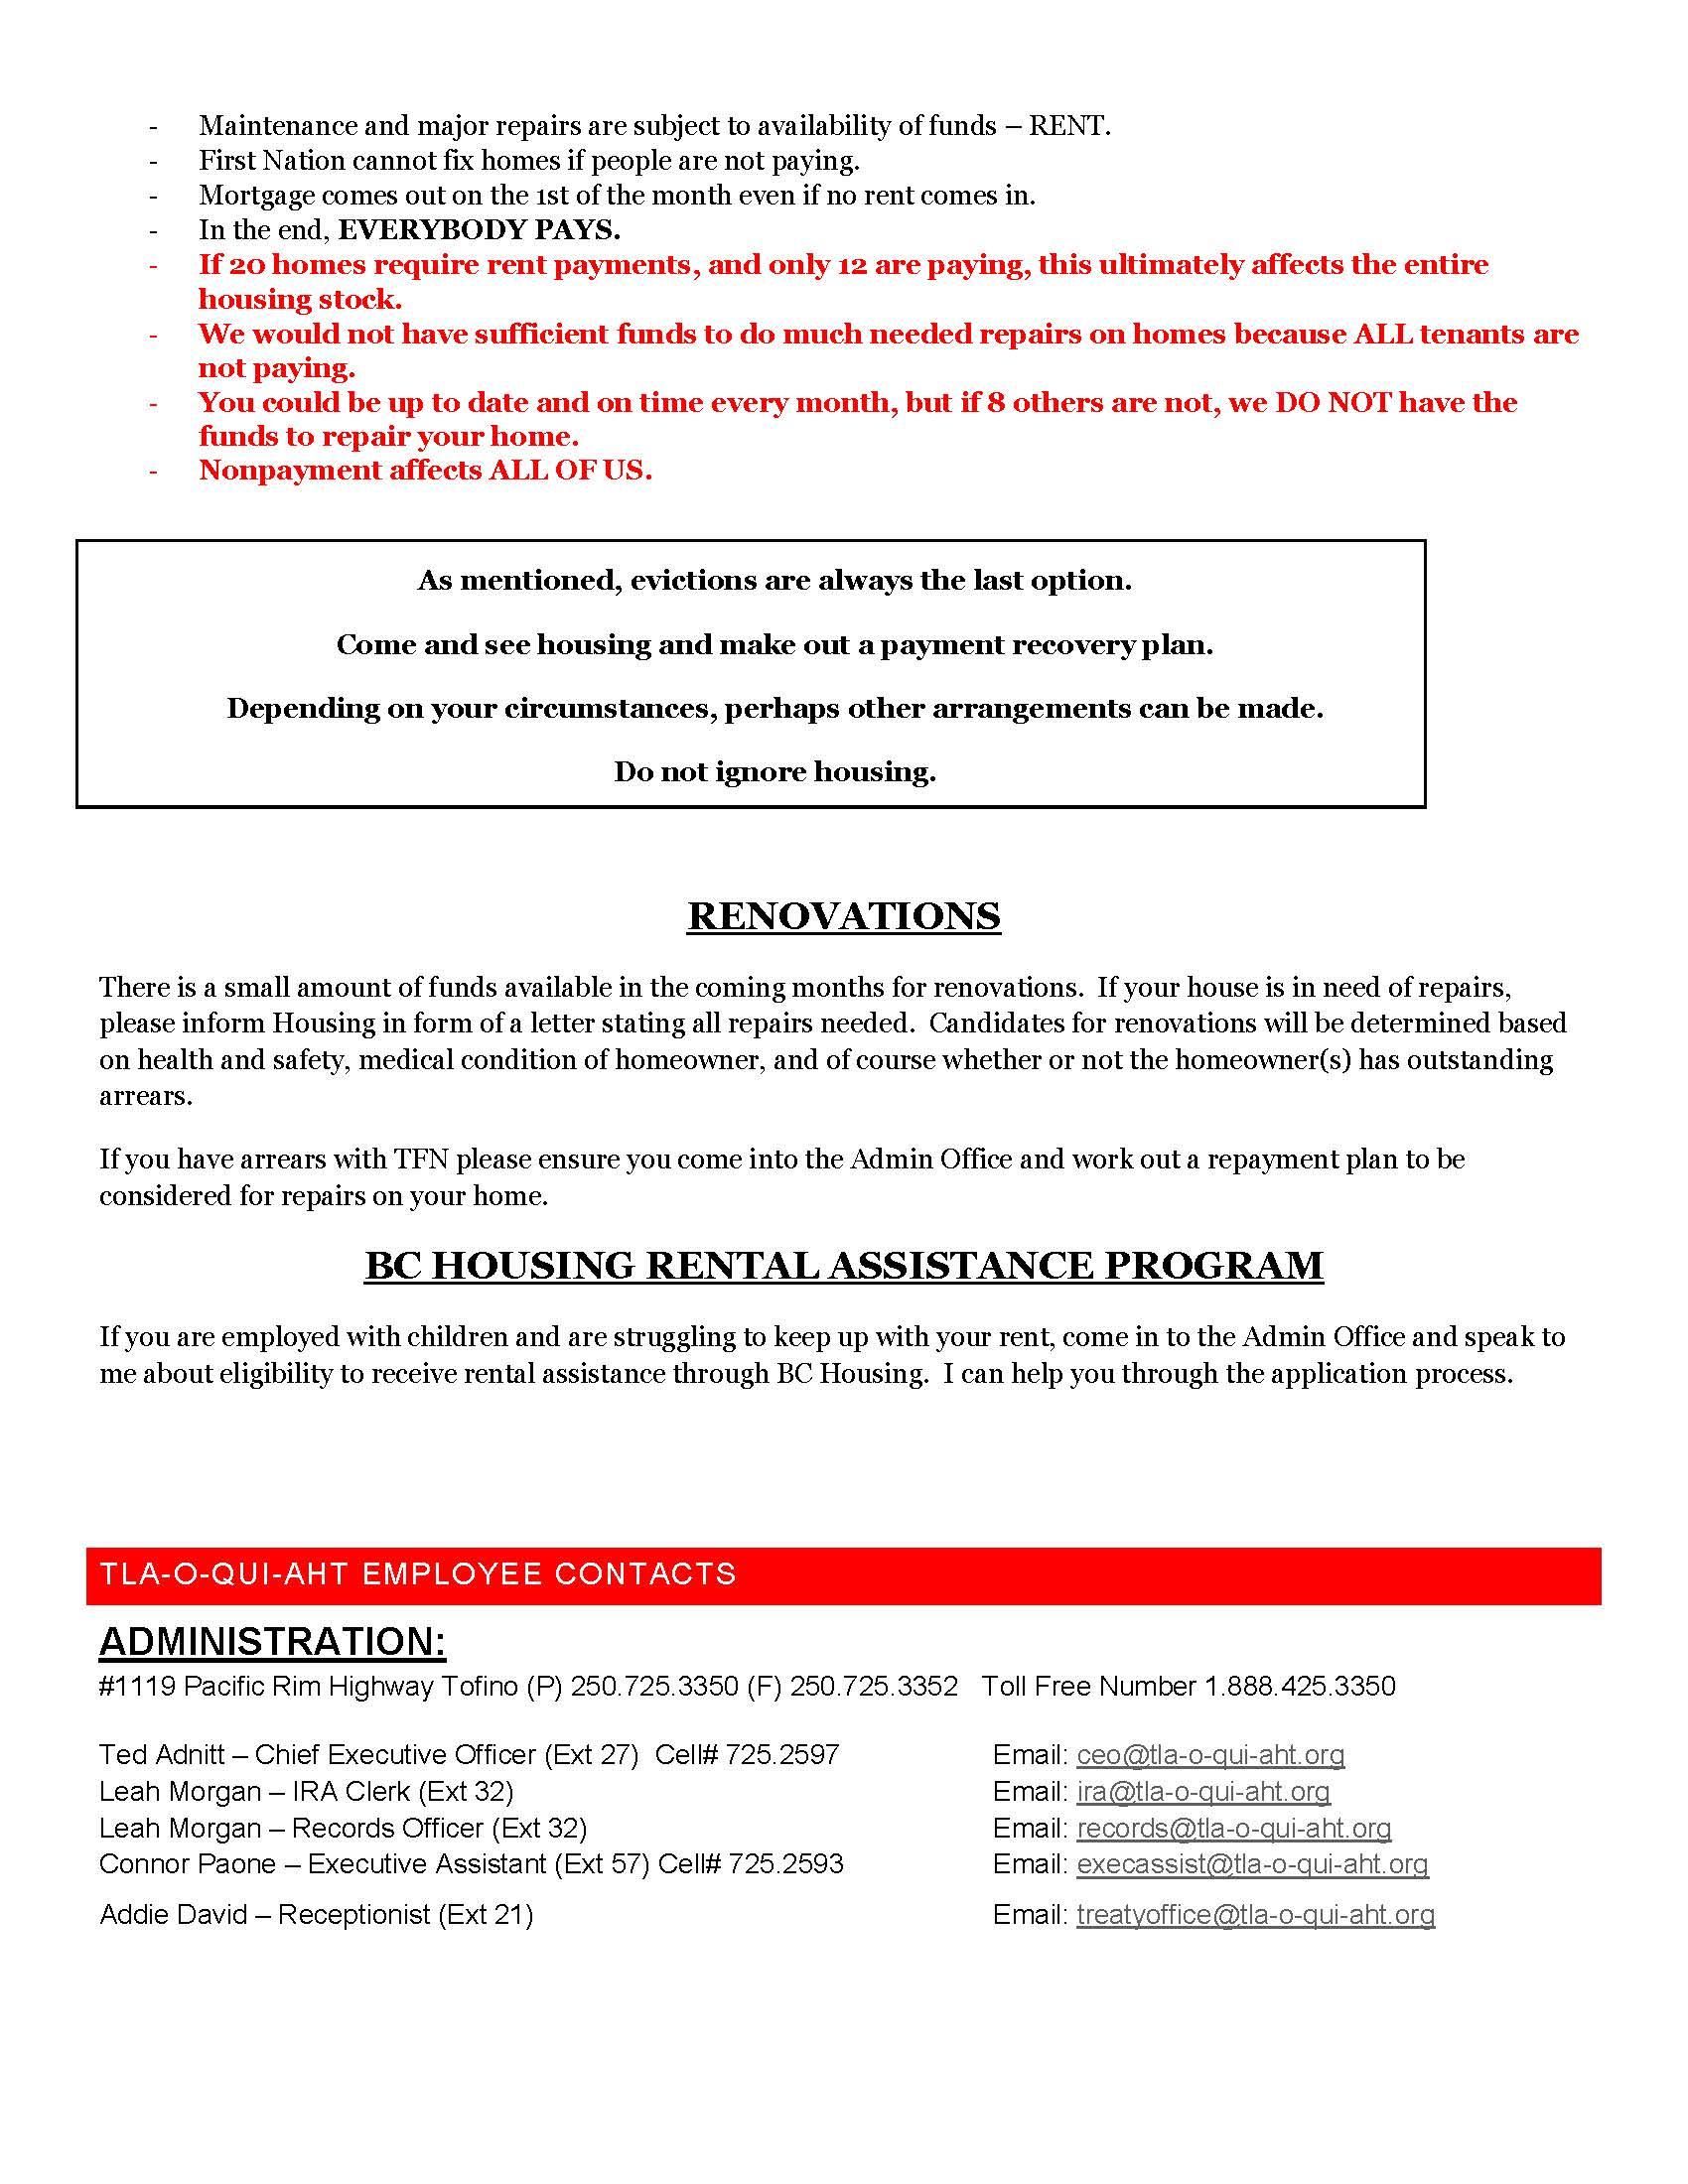 TFN Bulletin March 1 2017_Page_05.jpg